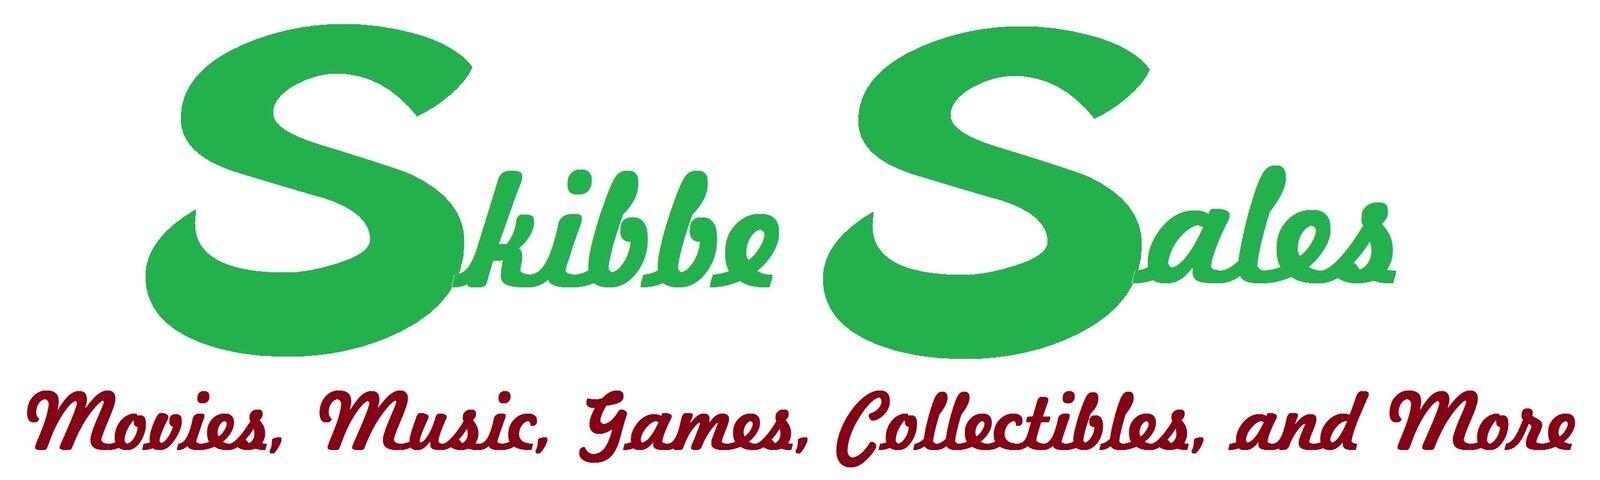 skibbe sales